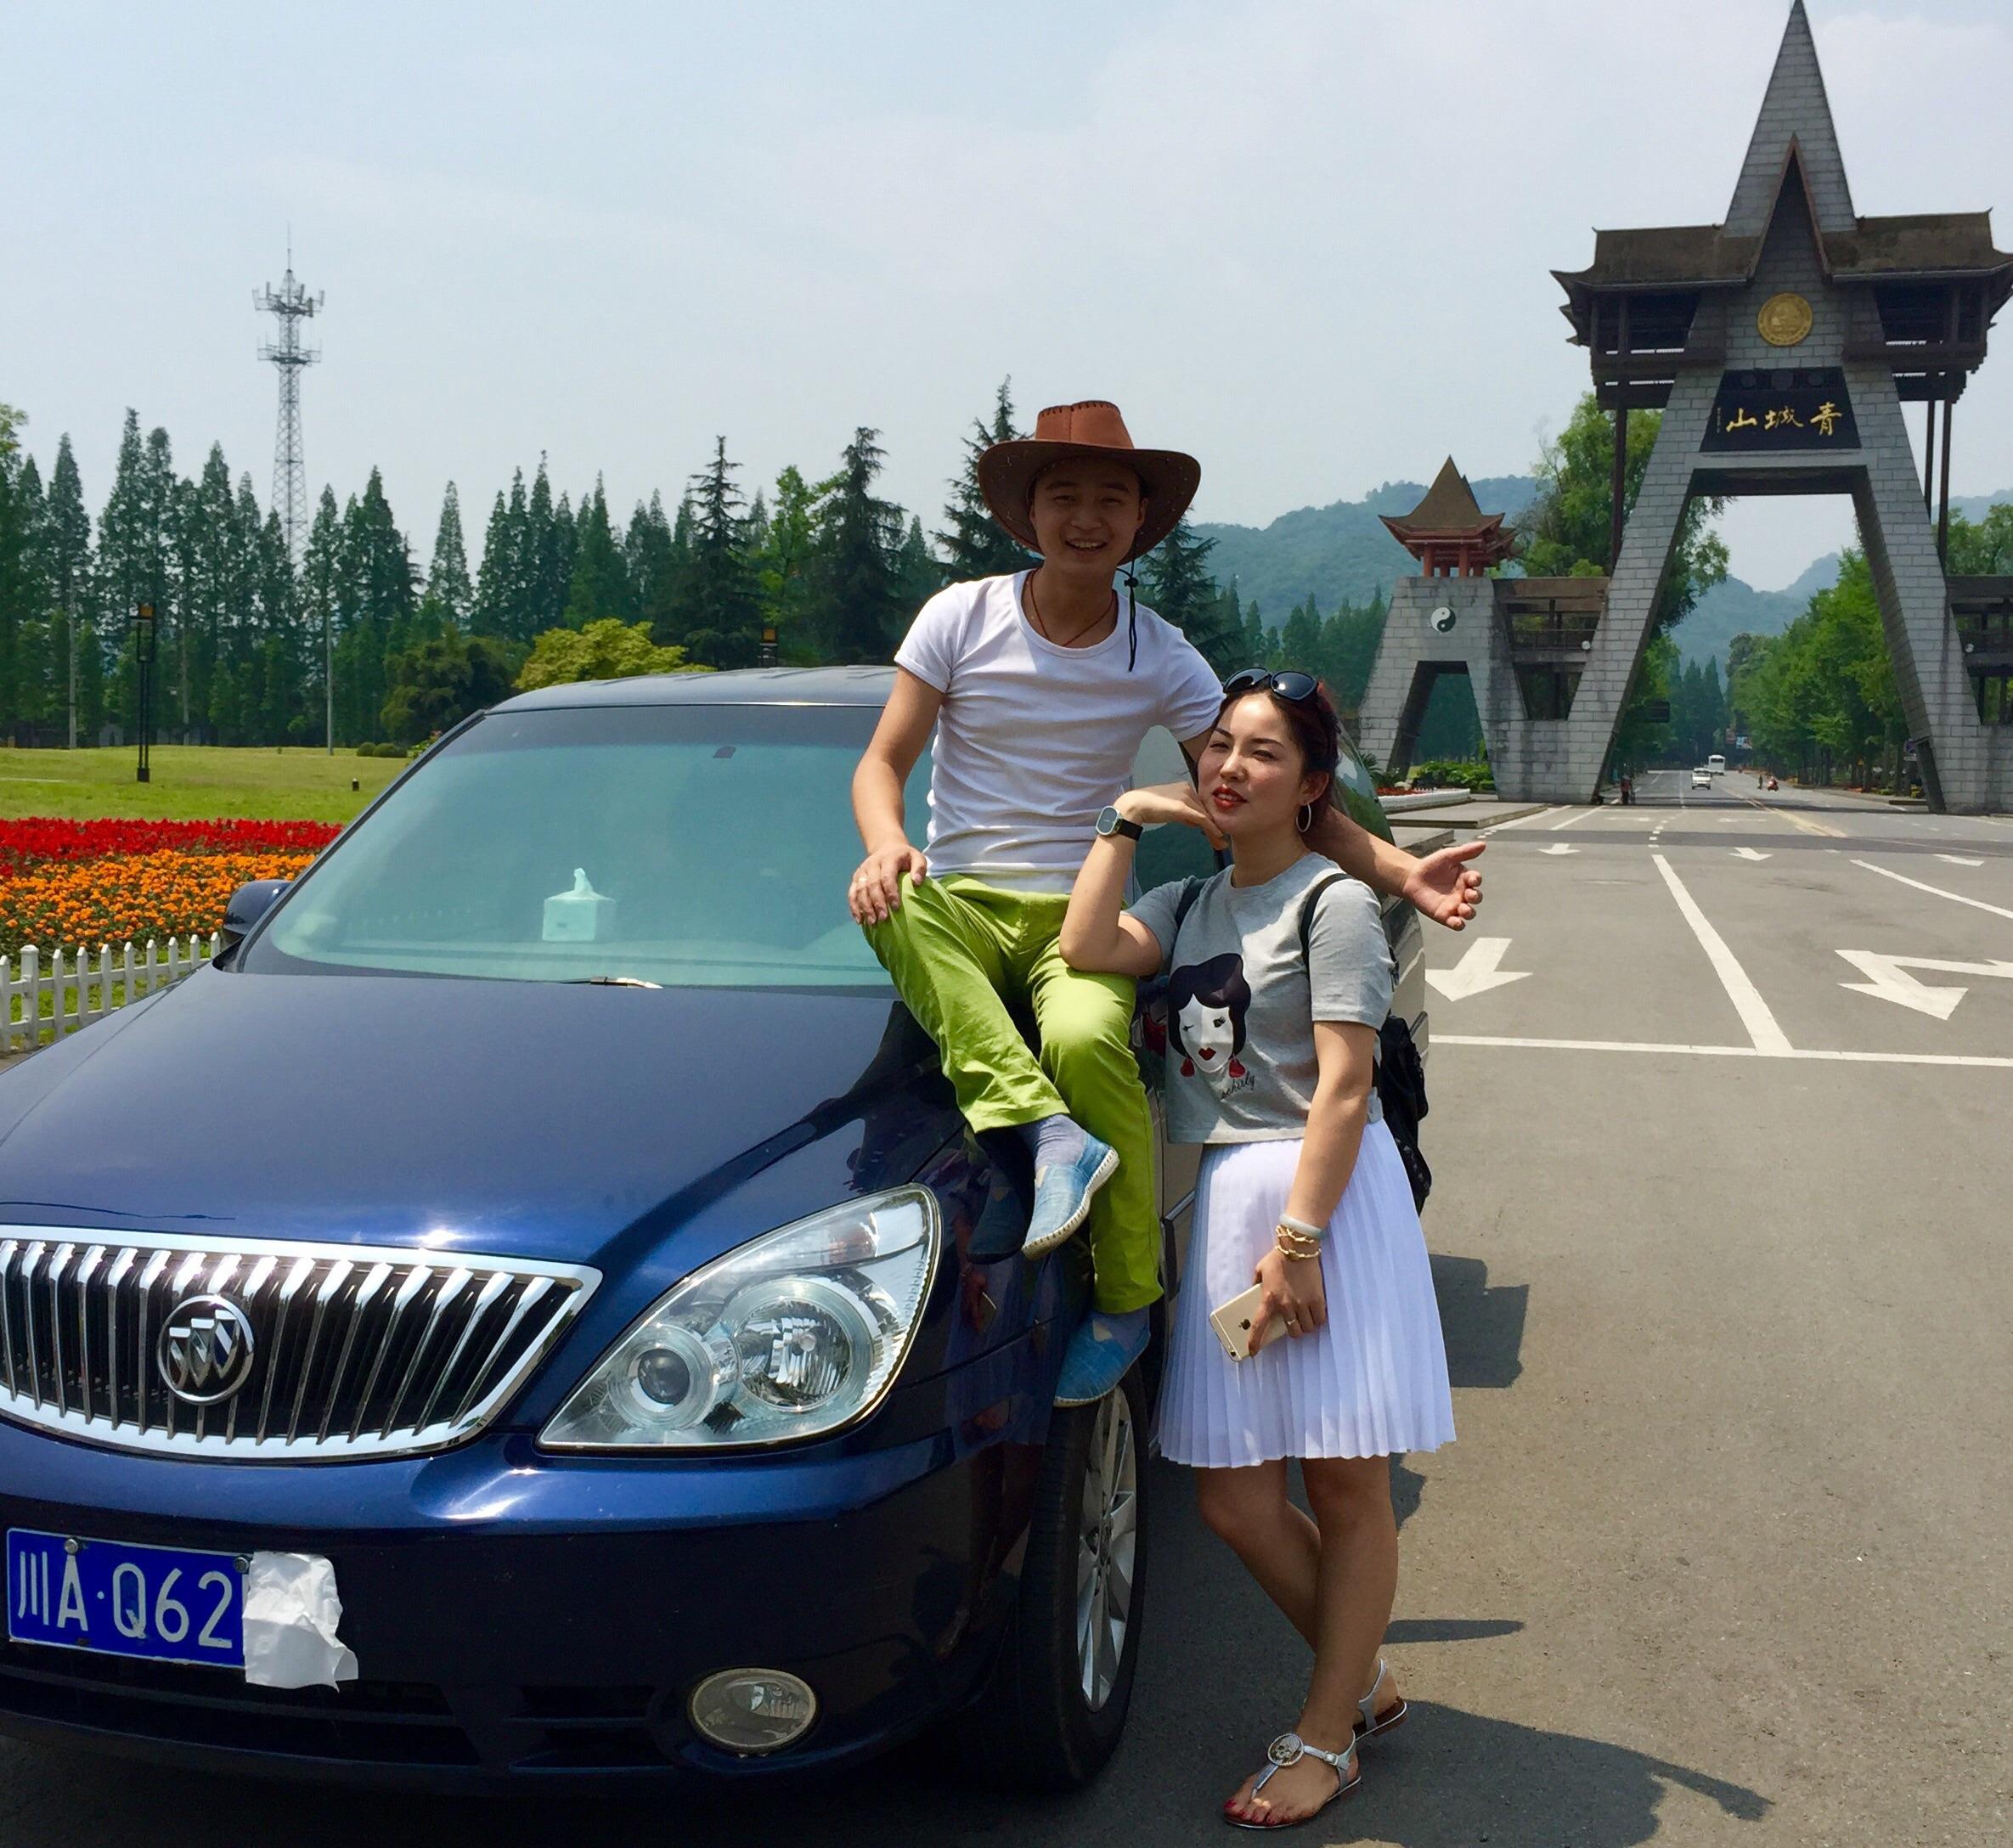 【Q】《去那儿网明星向导》一个好司机一个放心。川西旅游租车。